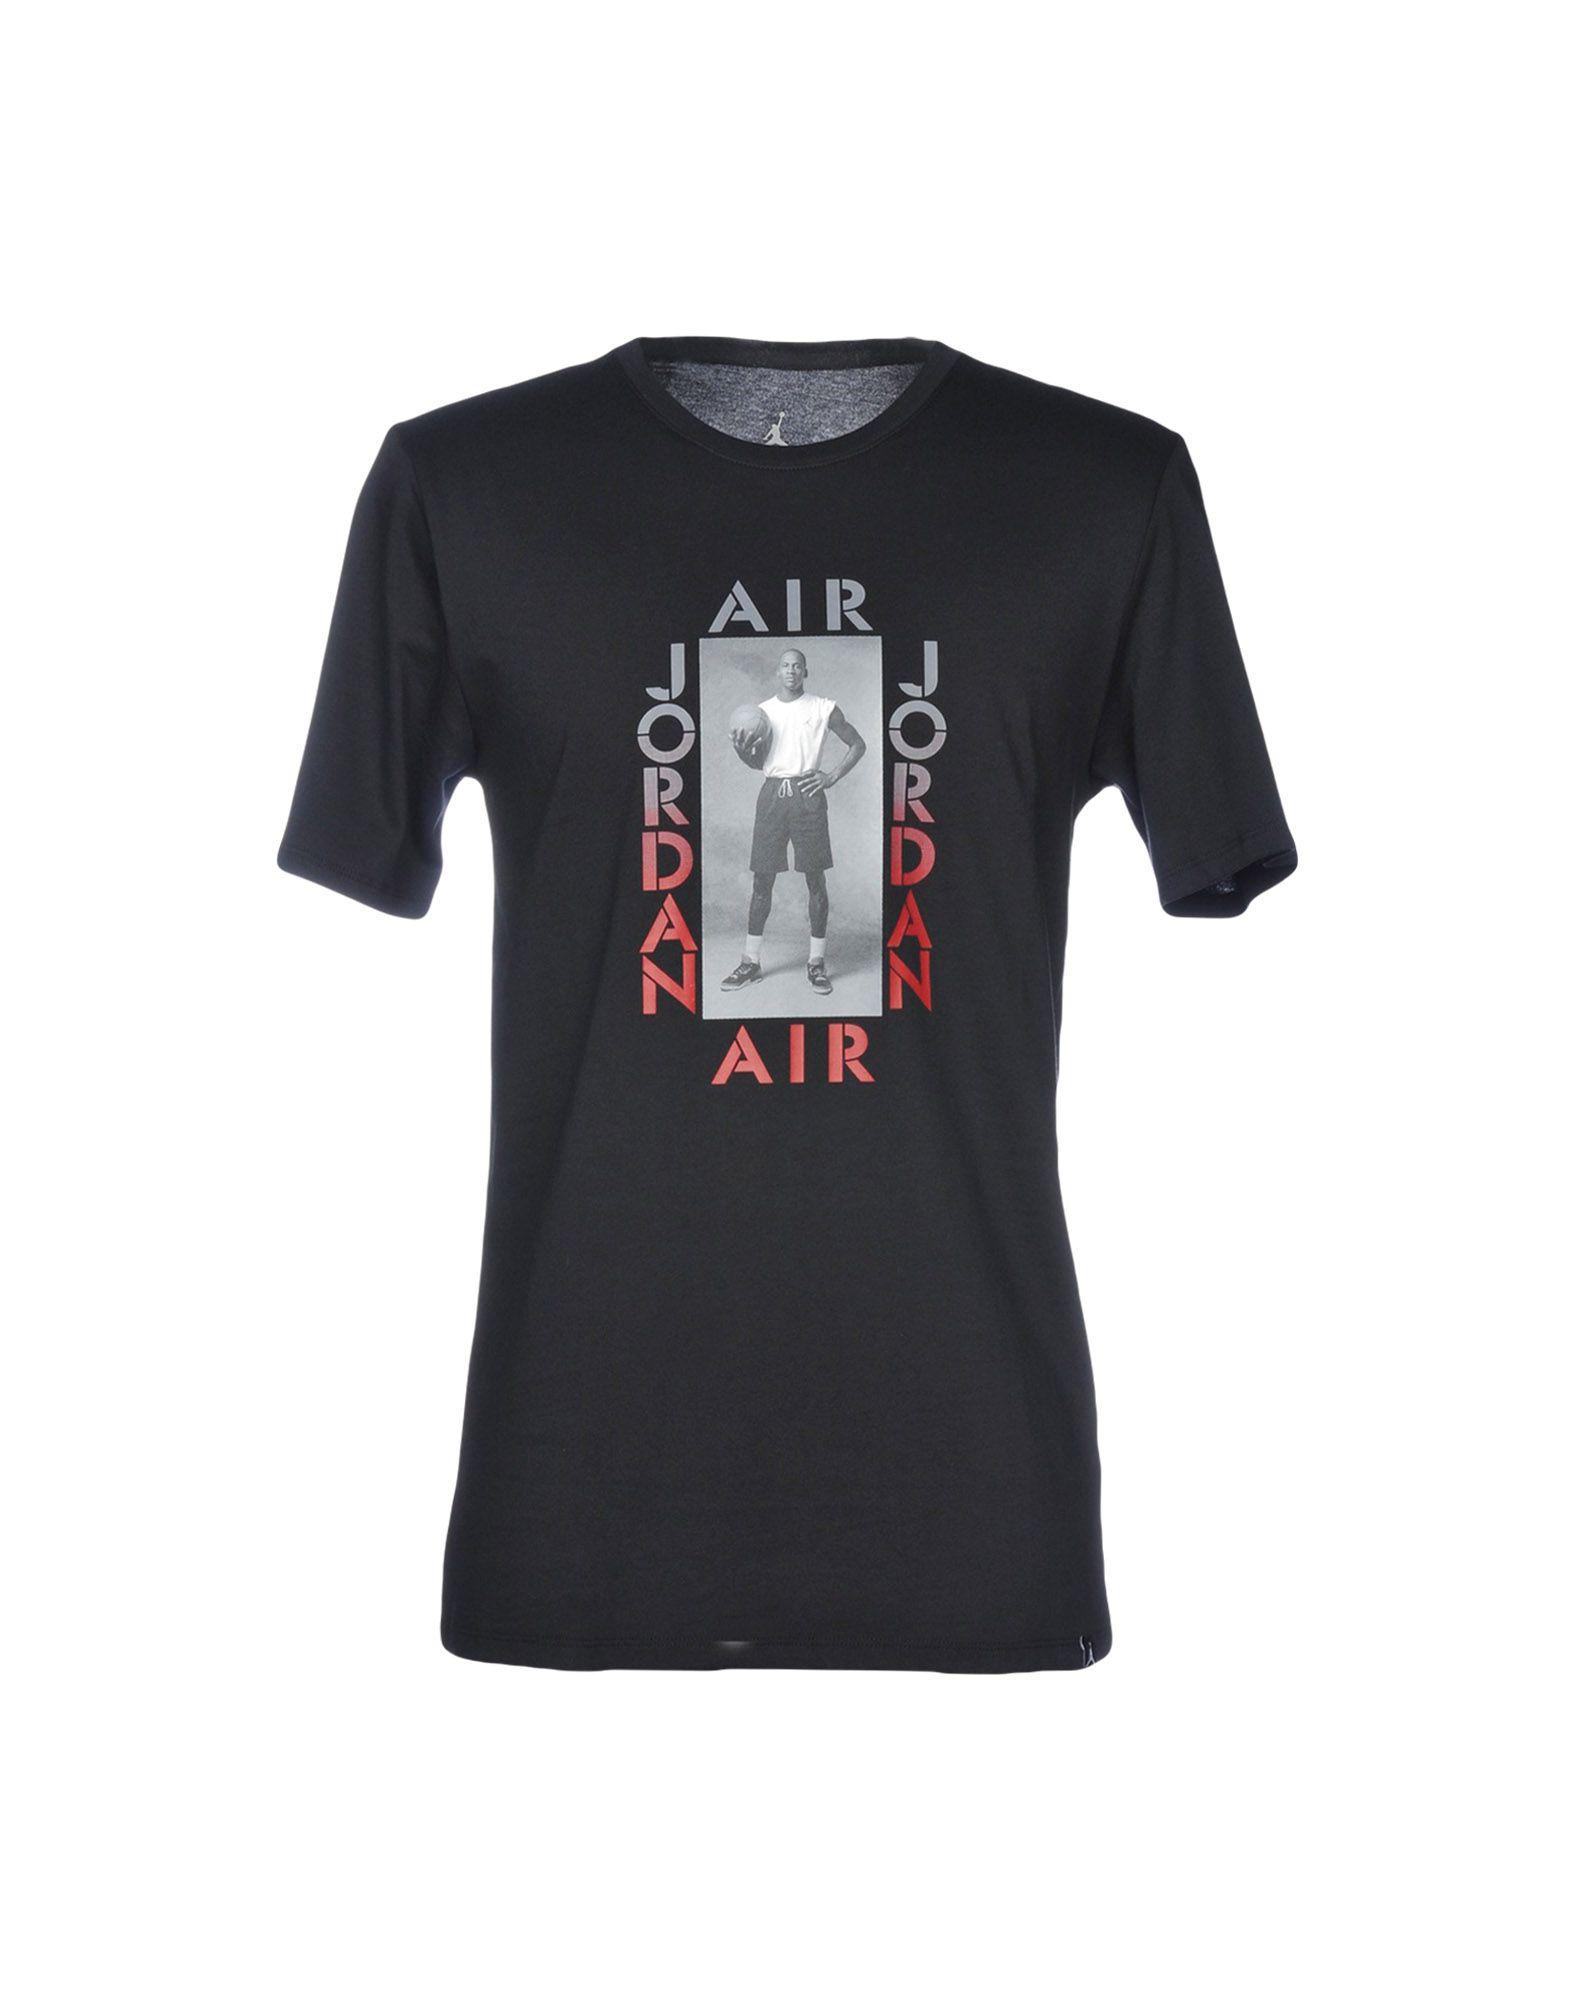 JORDAN Футболка баскетбольные кроссовки nike air jordan air jordan retro gs black infrared aj6 384665 023